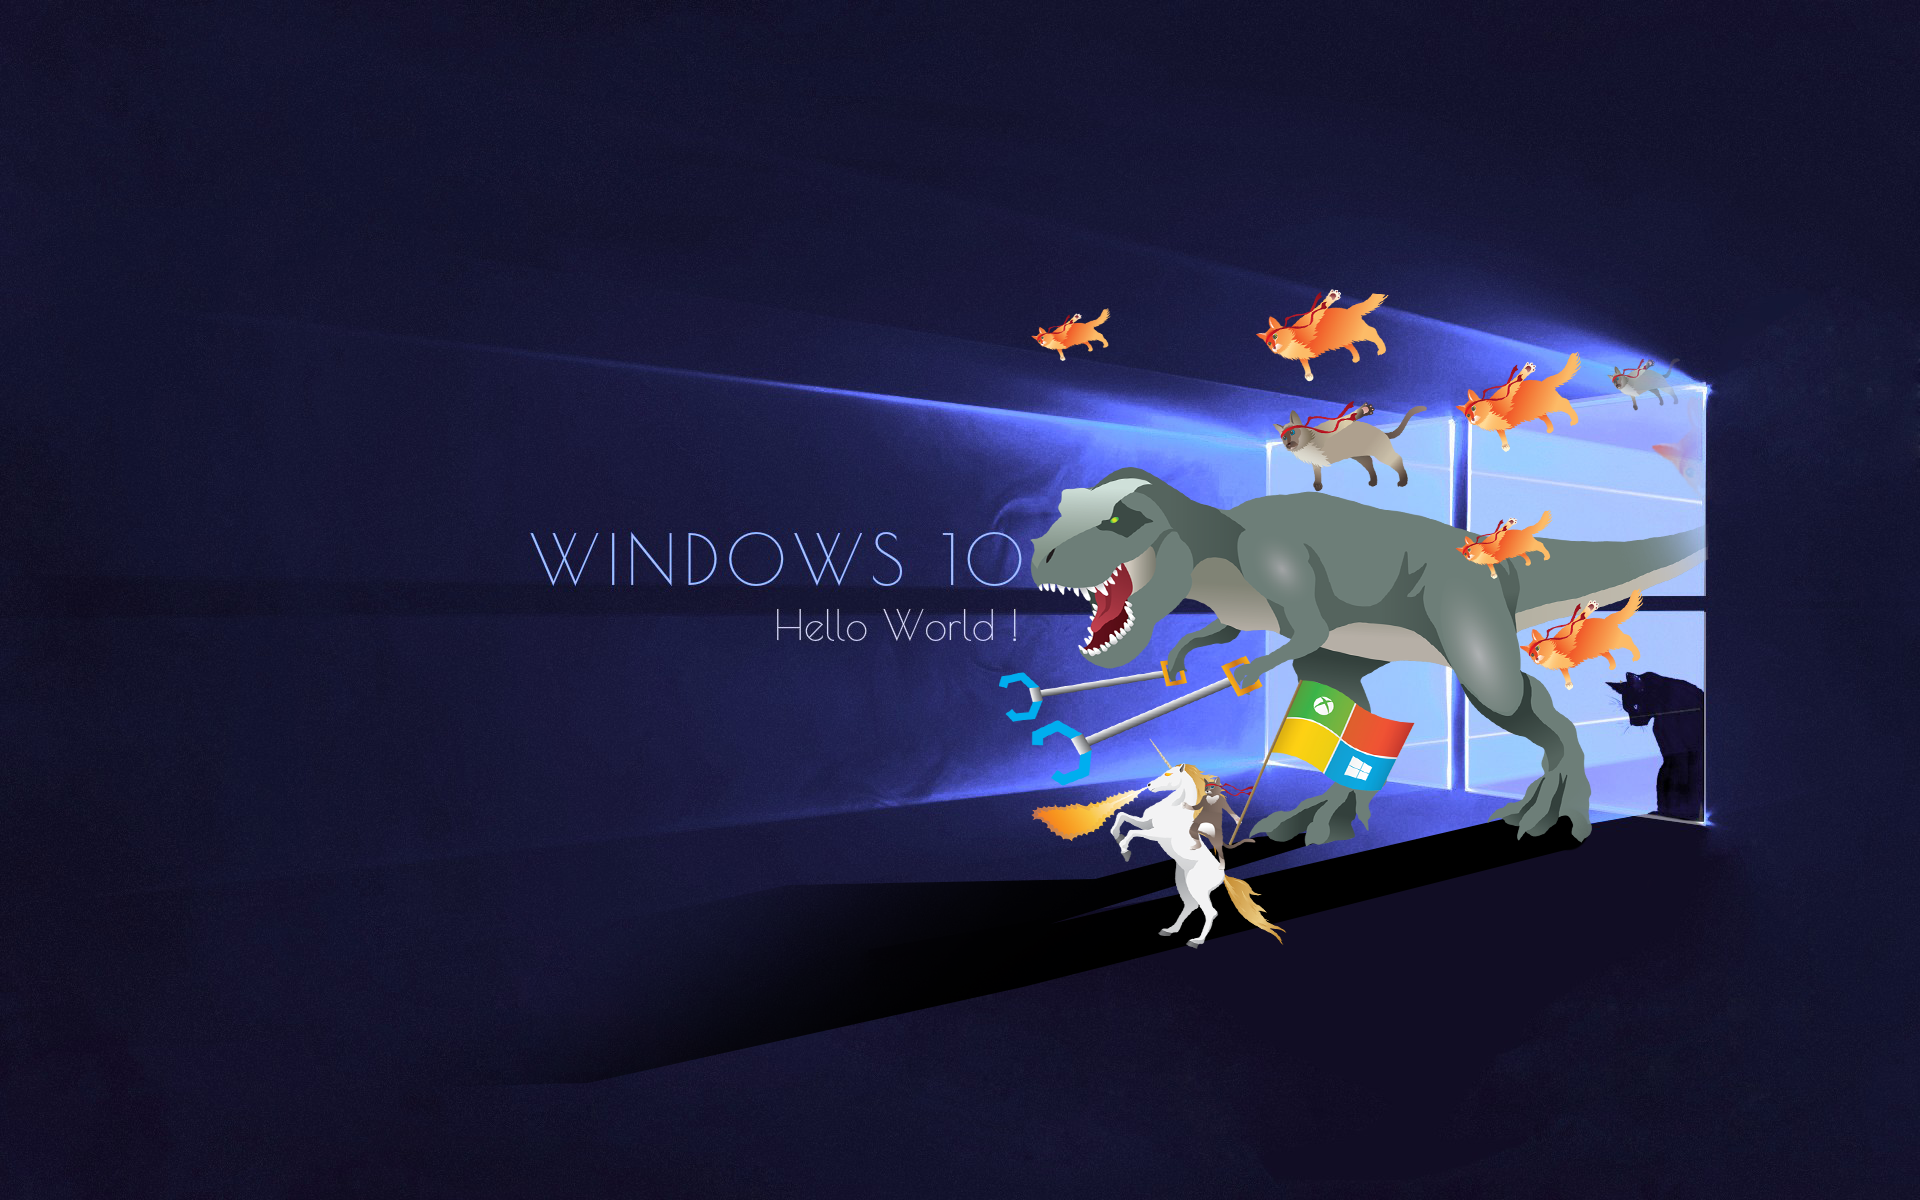 Ninja Cat Wallpaper Windows 10 - WallpaperSafari